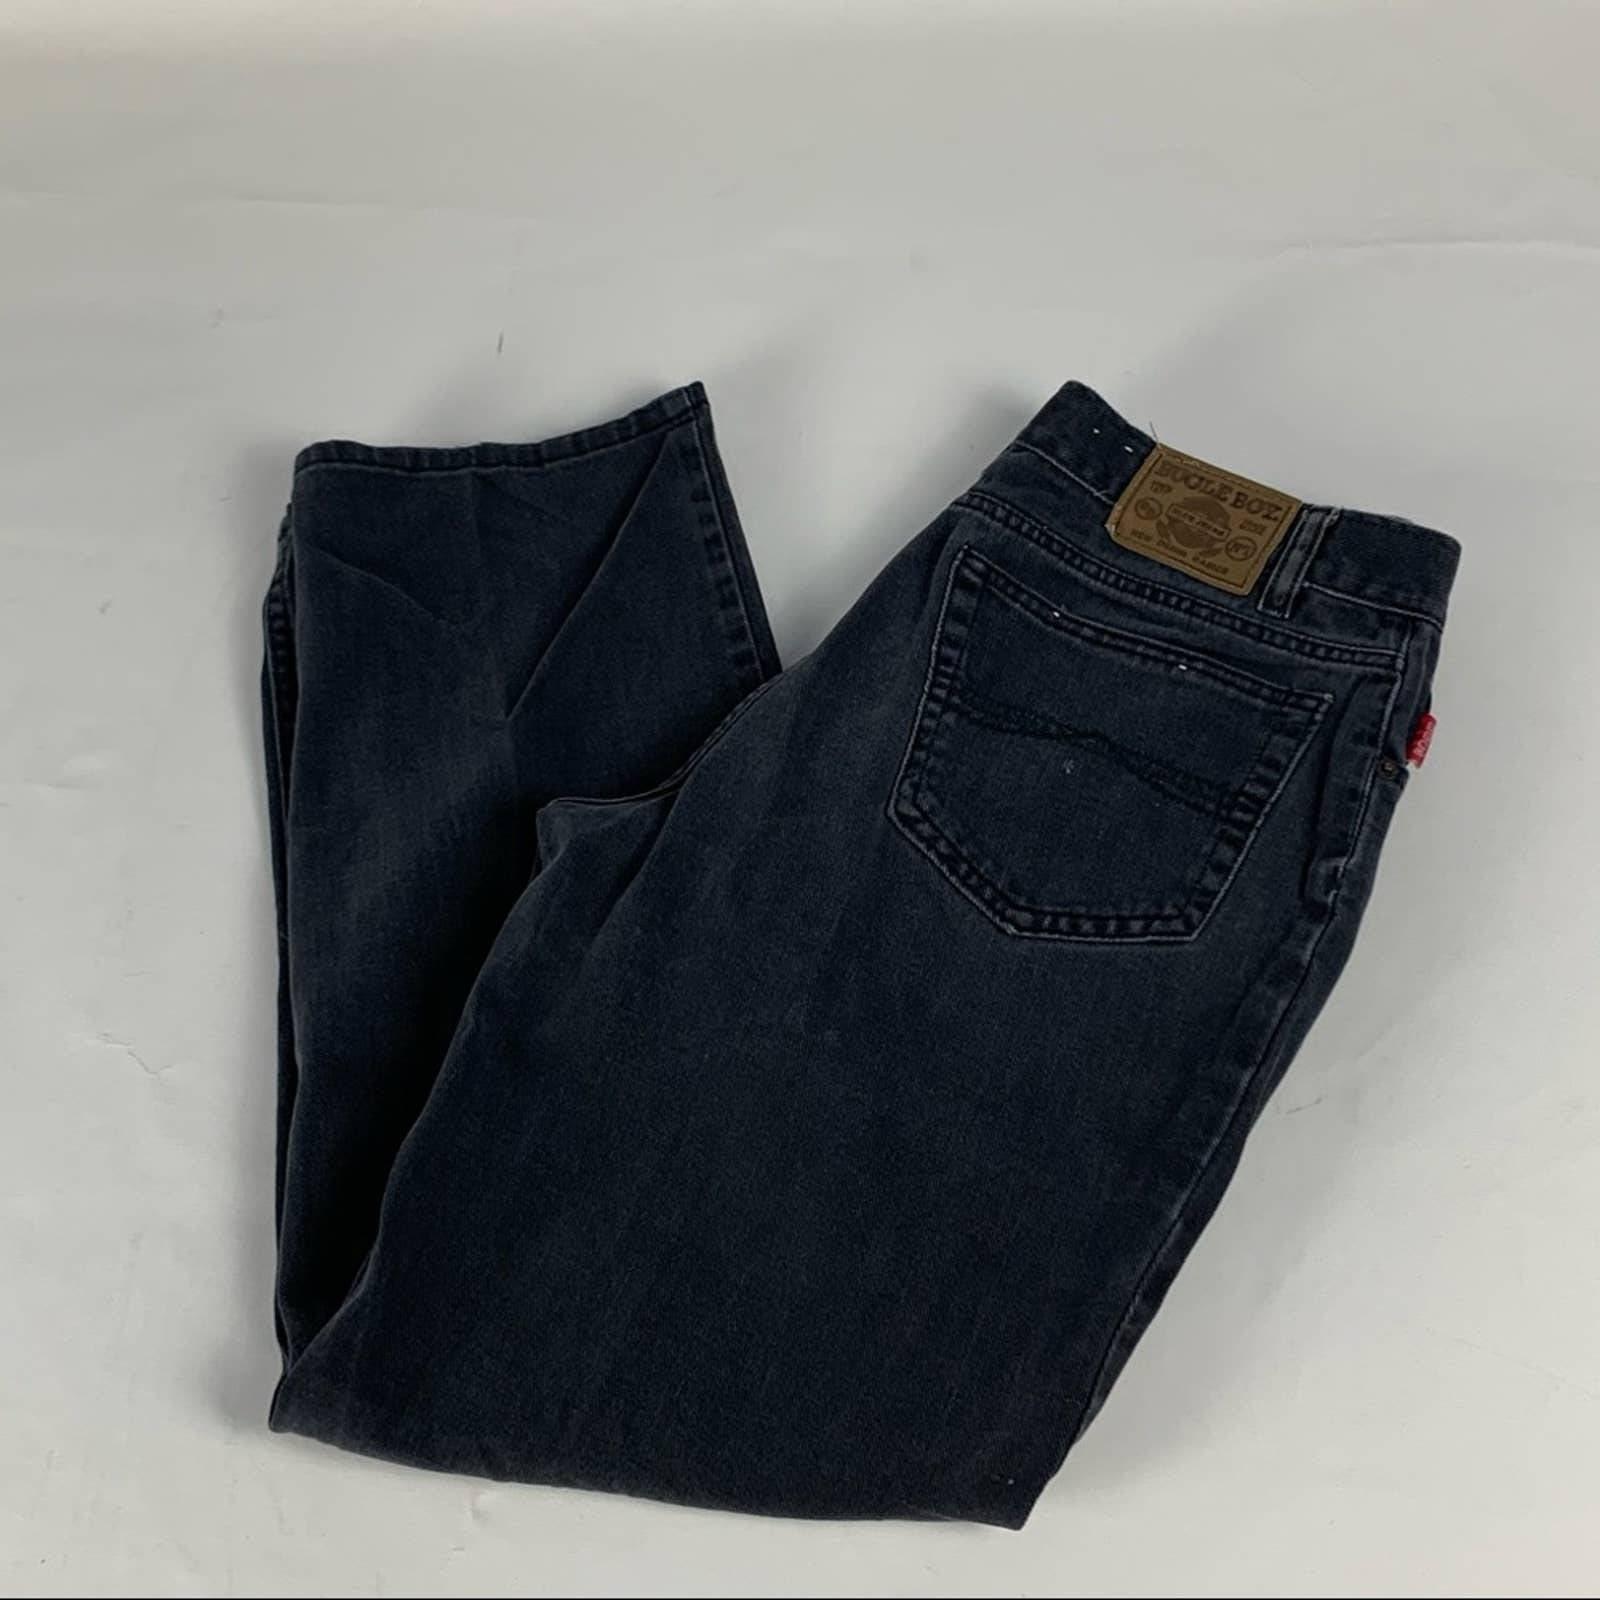 Vintage bugle boy black jeans